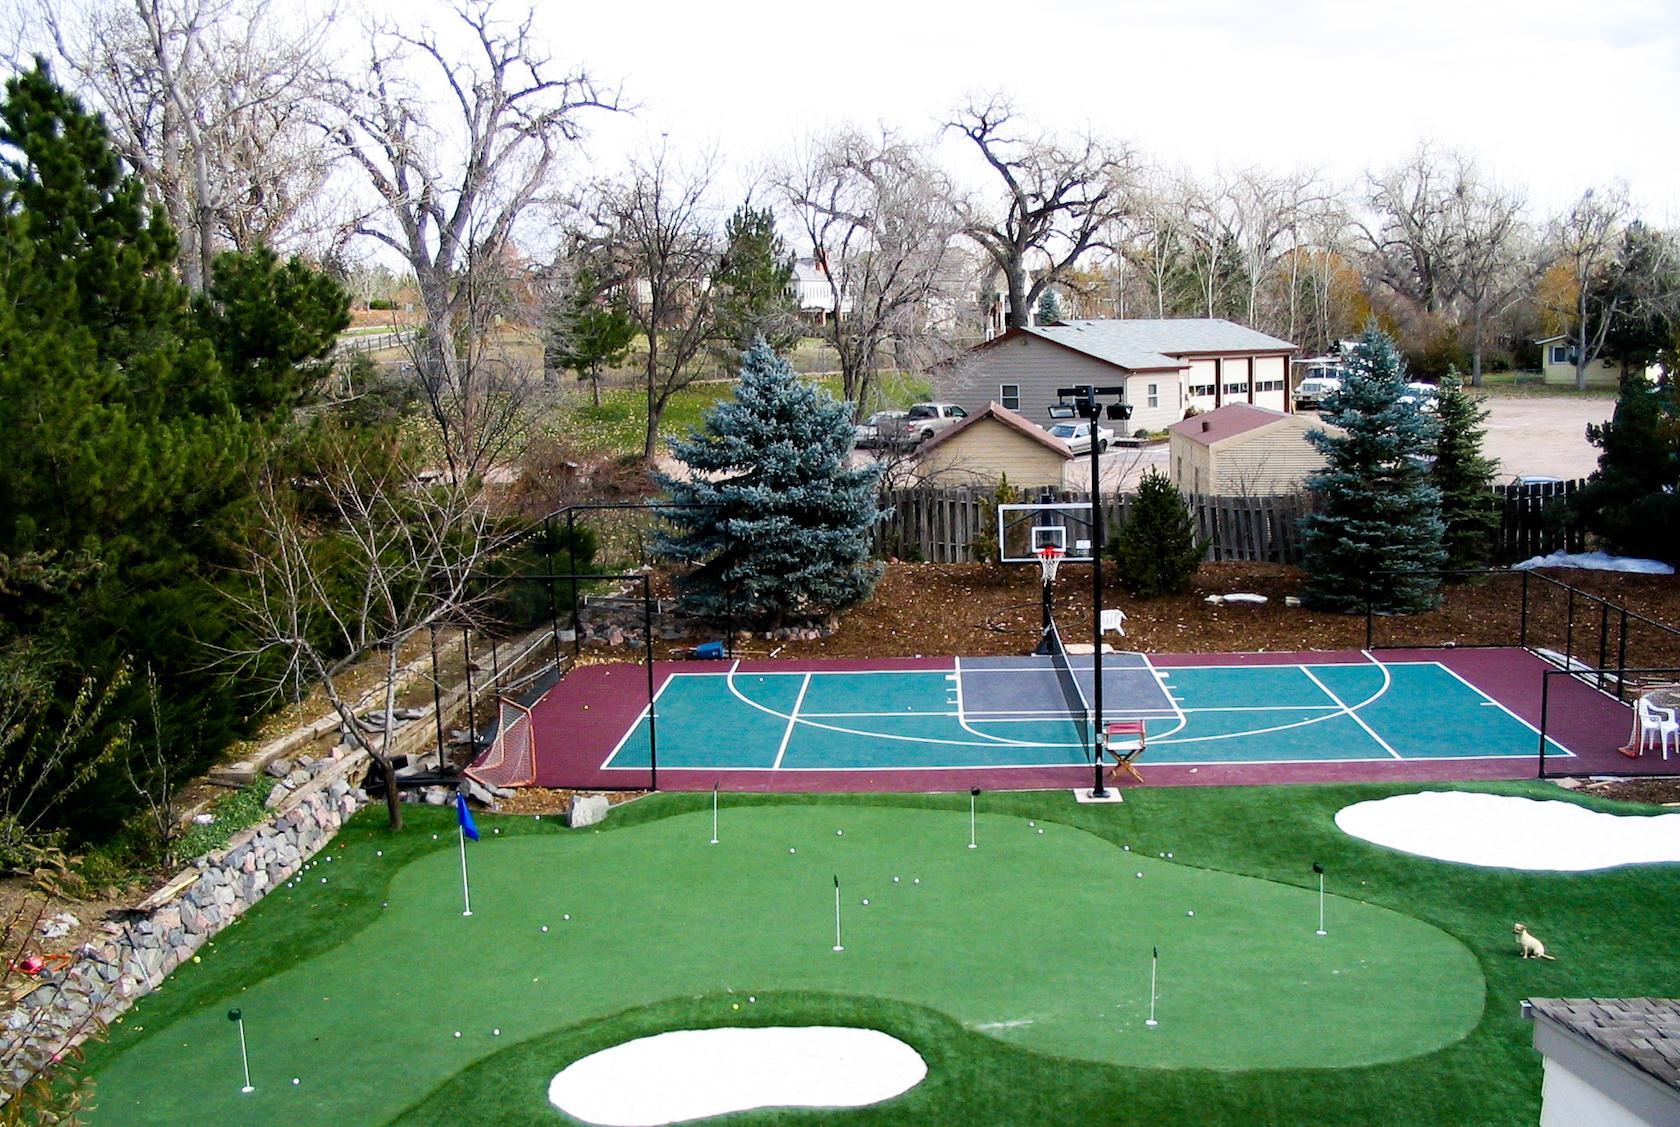 22.SIMPHOME.COM the dangers of a diy basketball court sport court